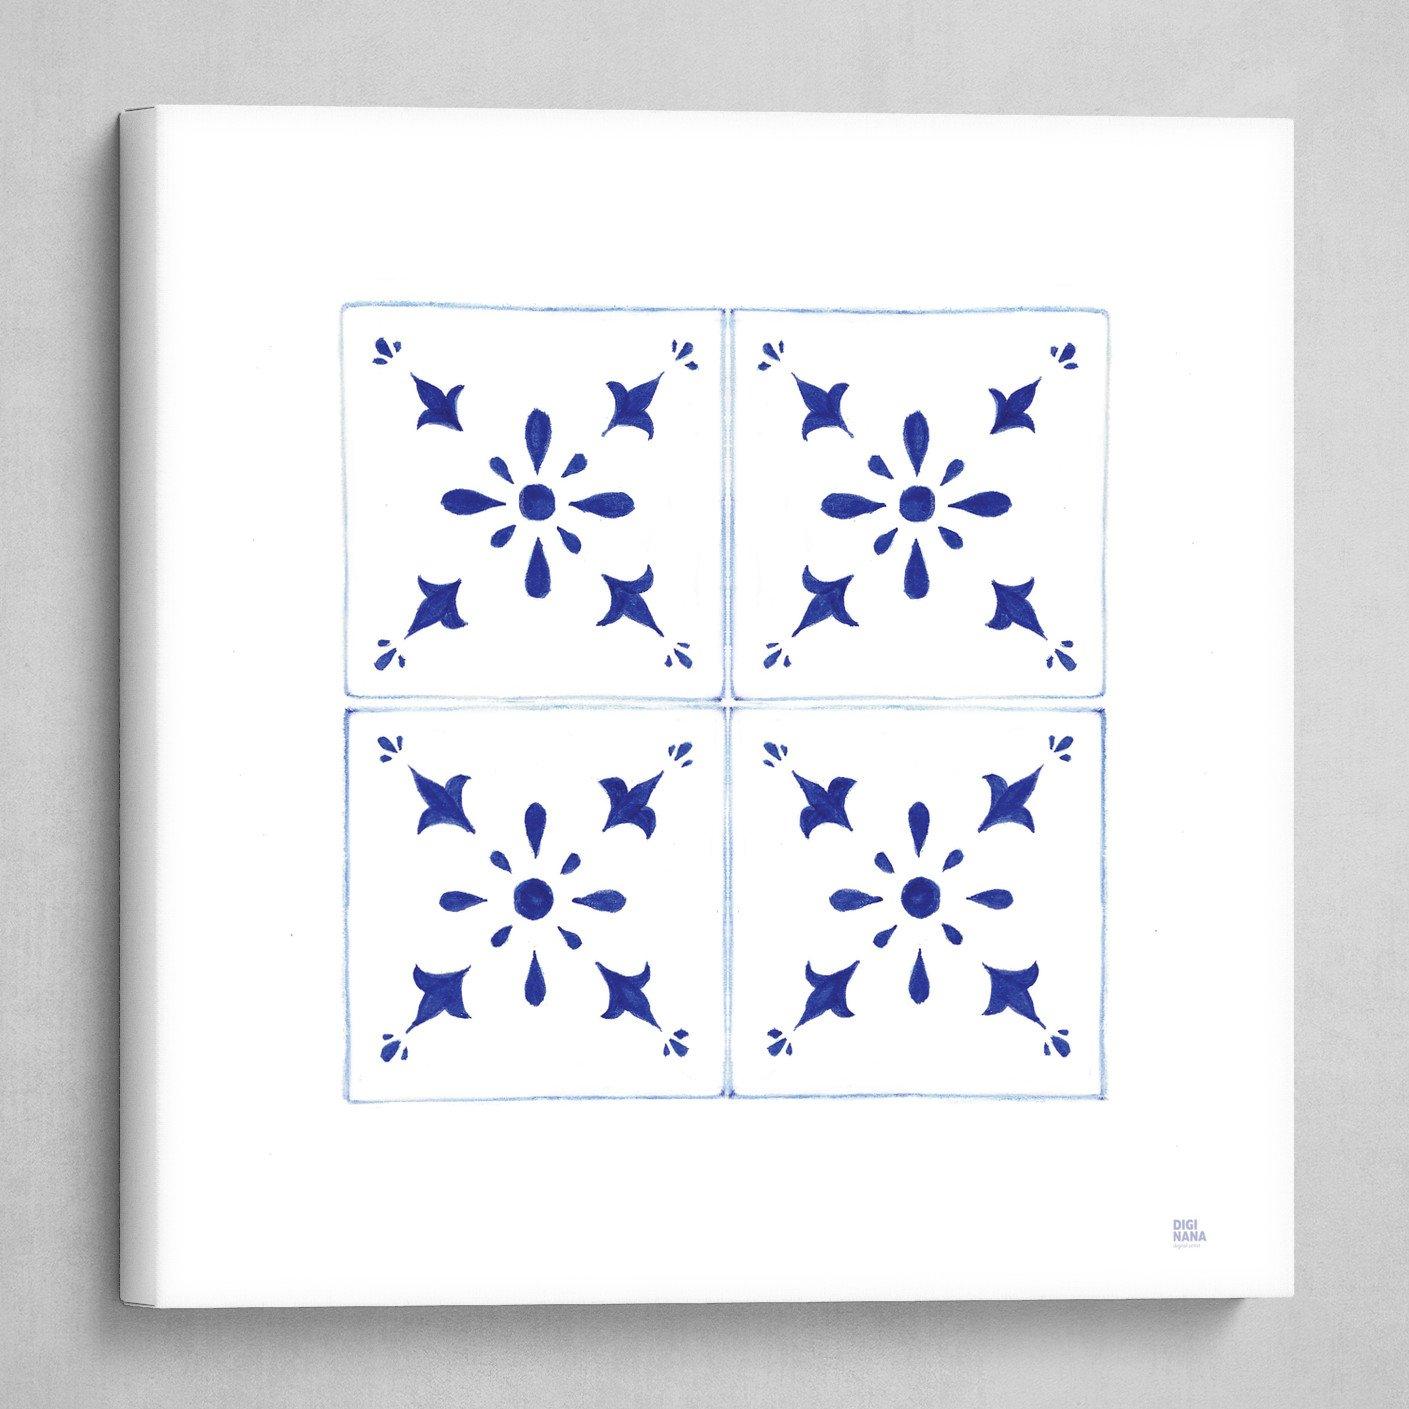 Porto's Tiles 3.0 (square)